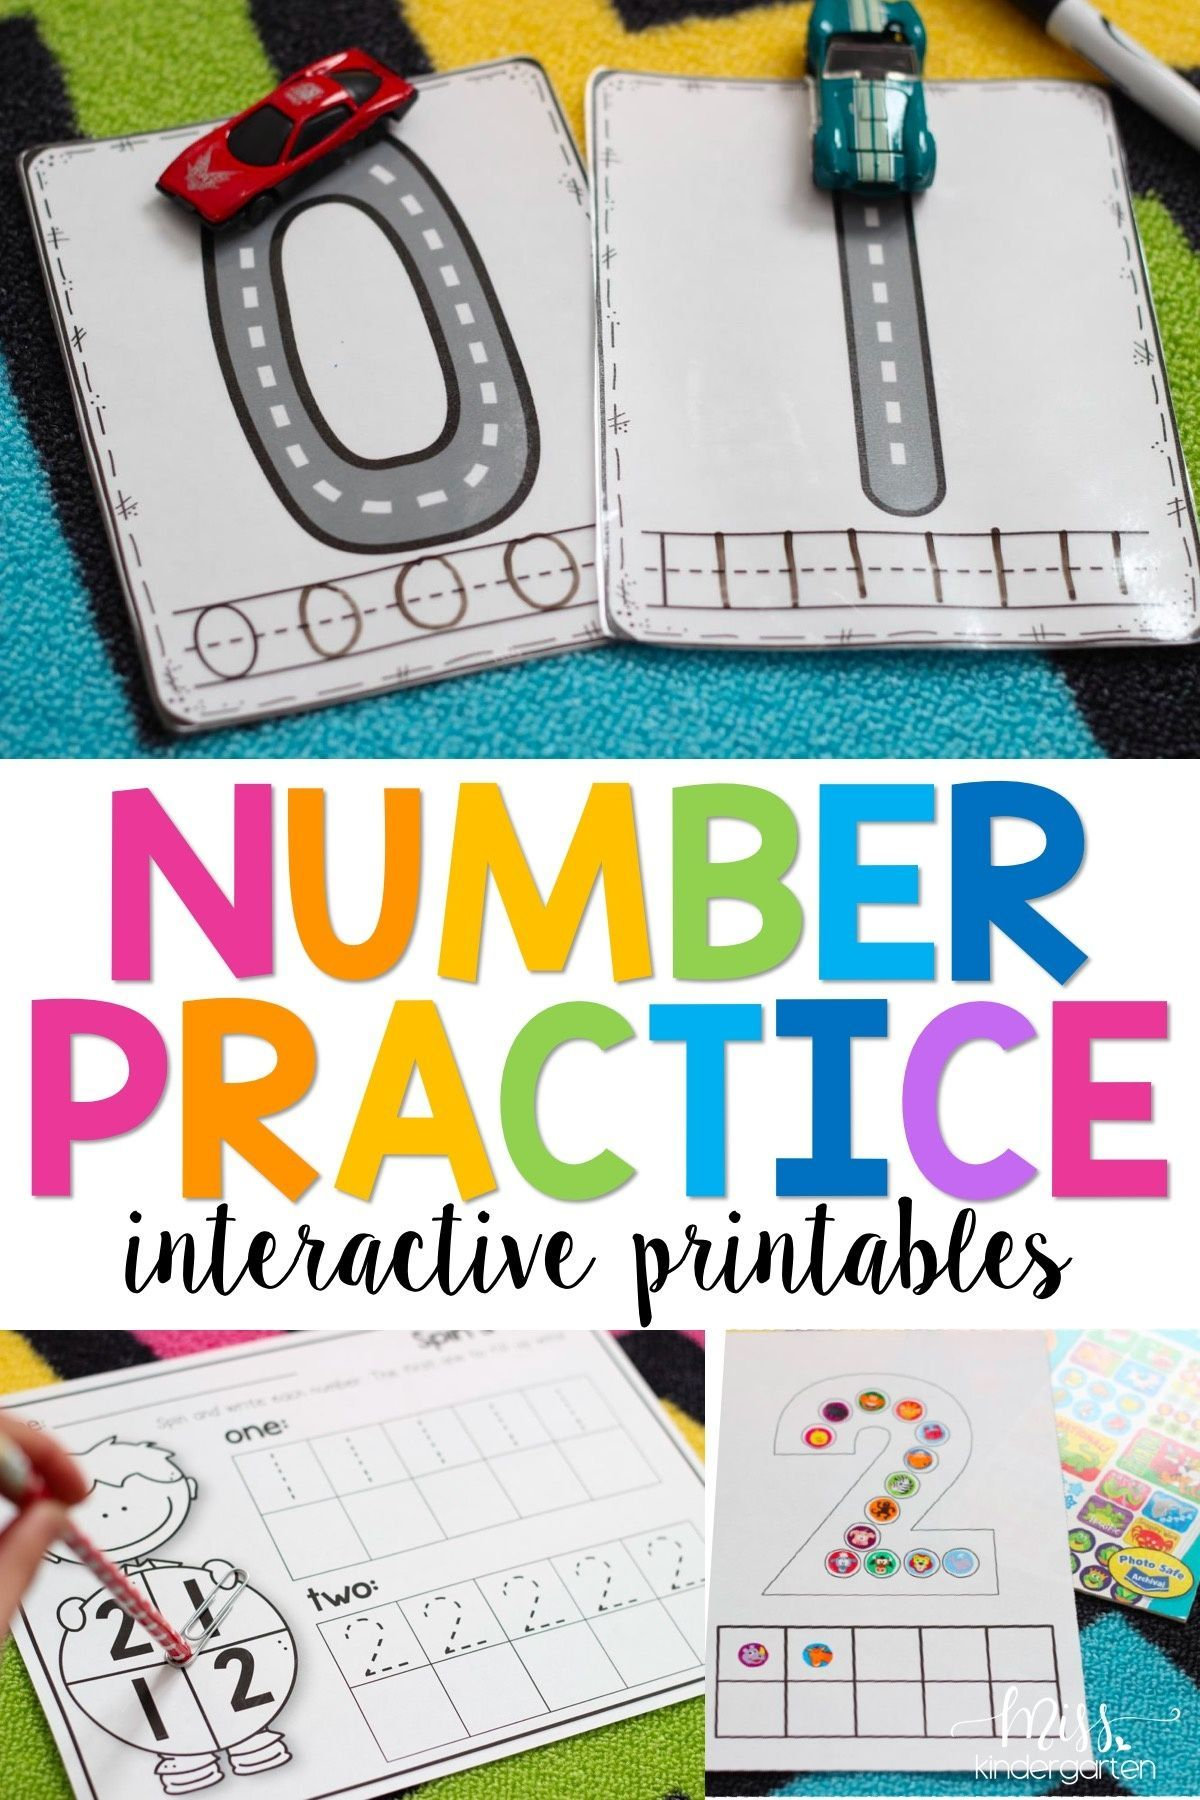 Number Practice Interactive Printables Bundle